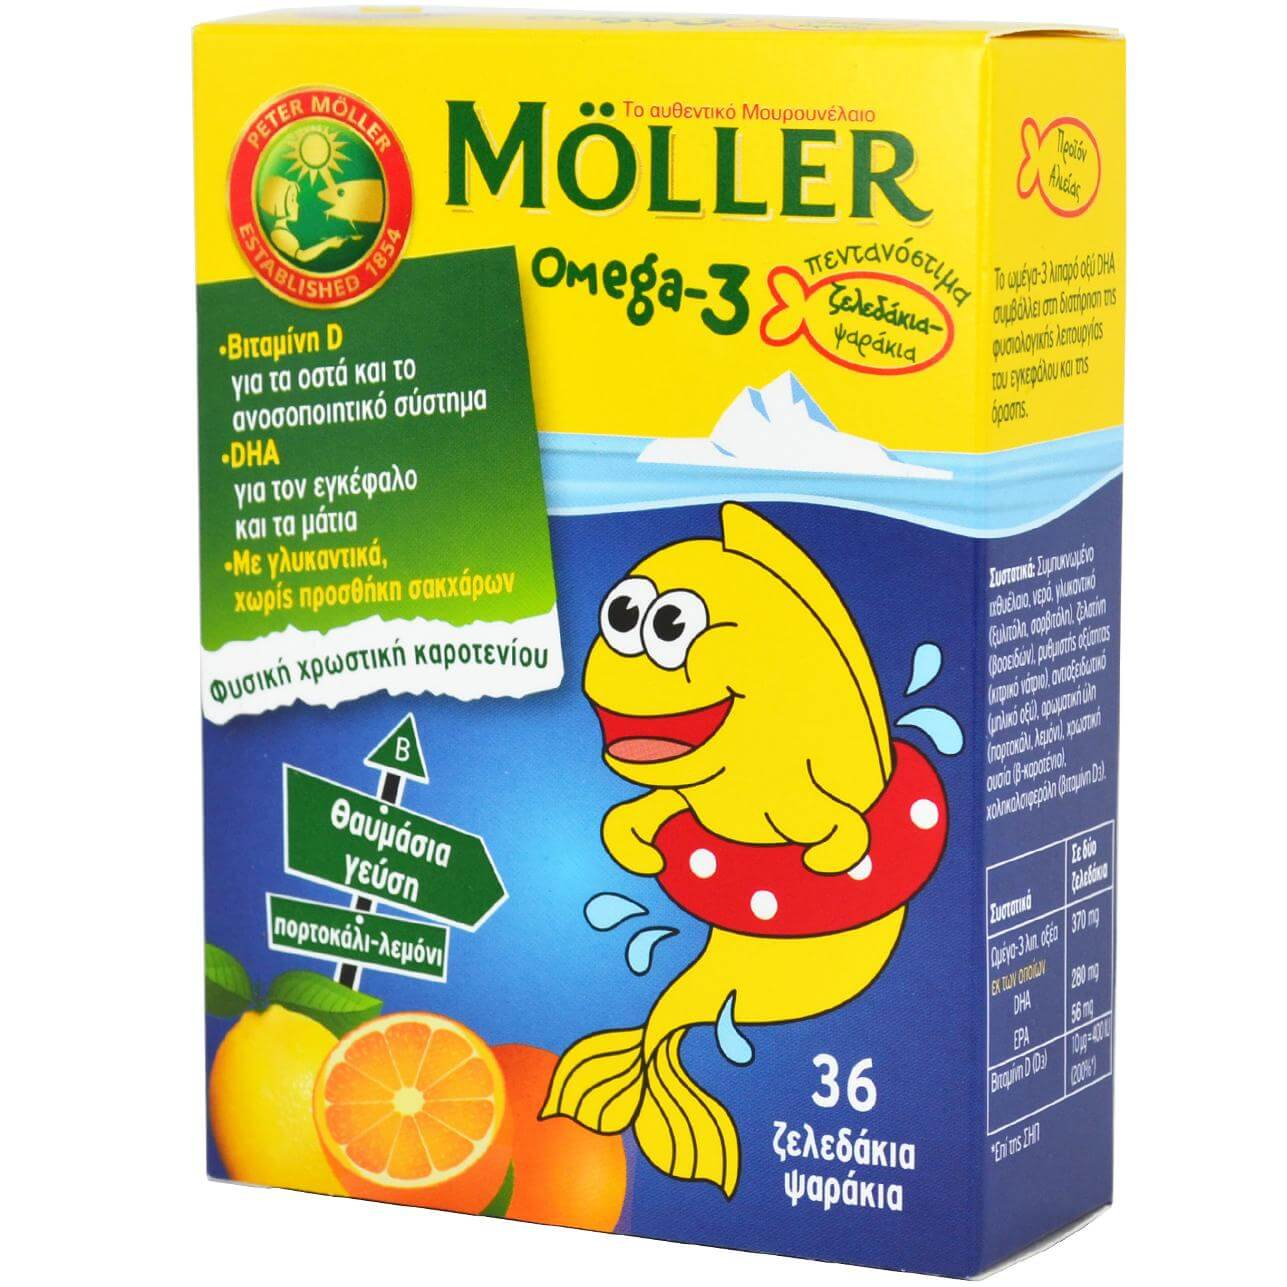 Möller's Ω3 Λιπαρά Οξέα Ειδικά Σχεδιασμένο για Παιδιά, με Γεύση Πορτοκάλι – Λεμόνι, 36 gummies